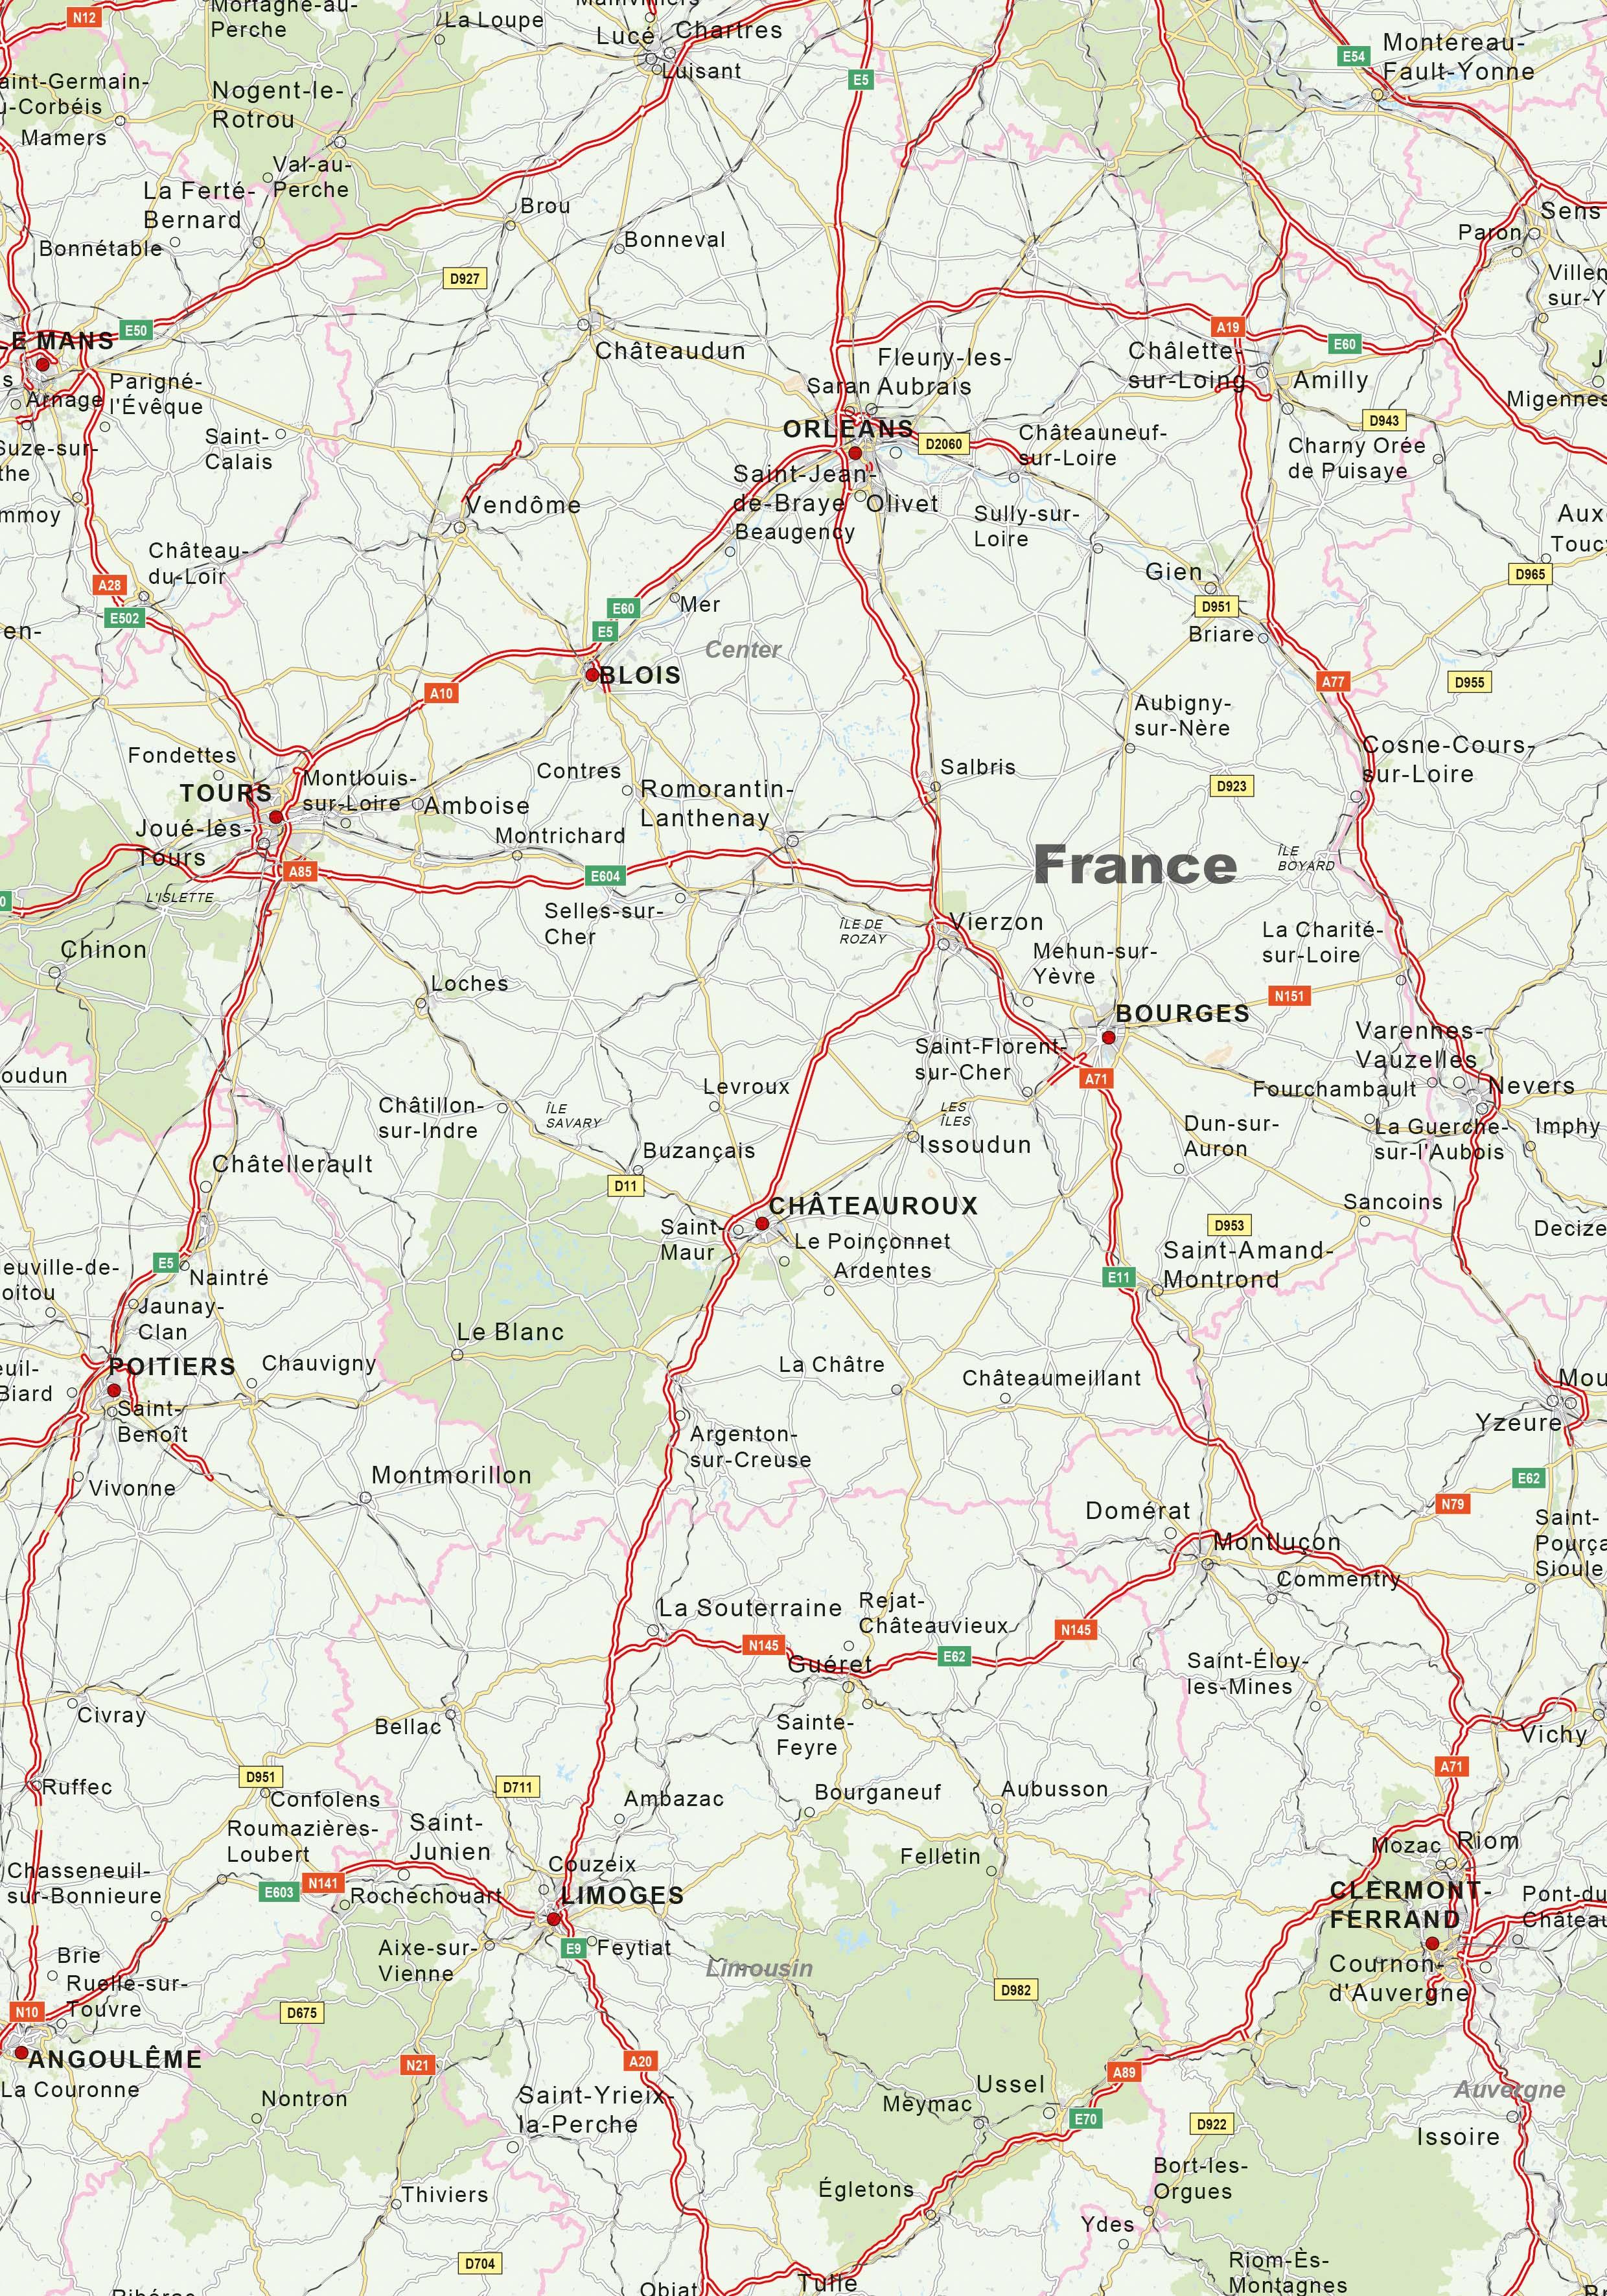 Digital Roadmap France 1415 | The World of Maps.com on